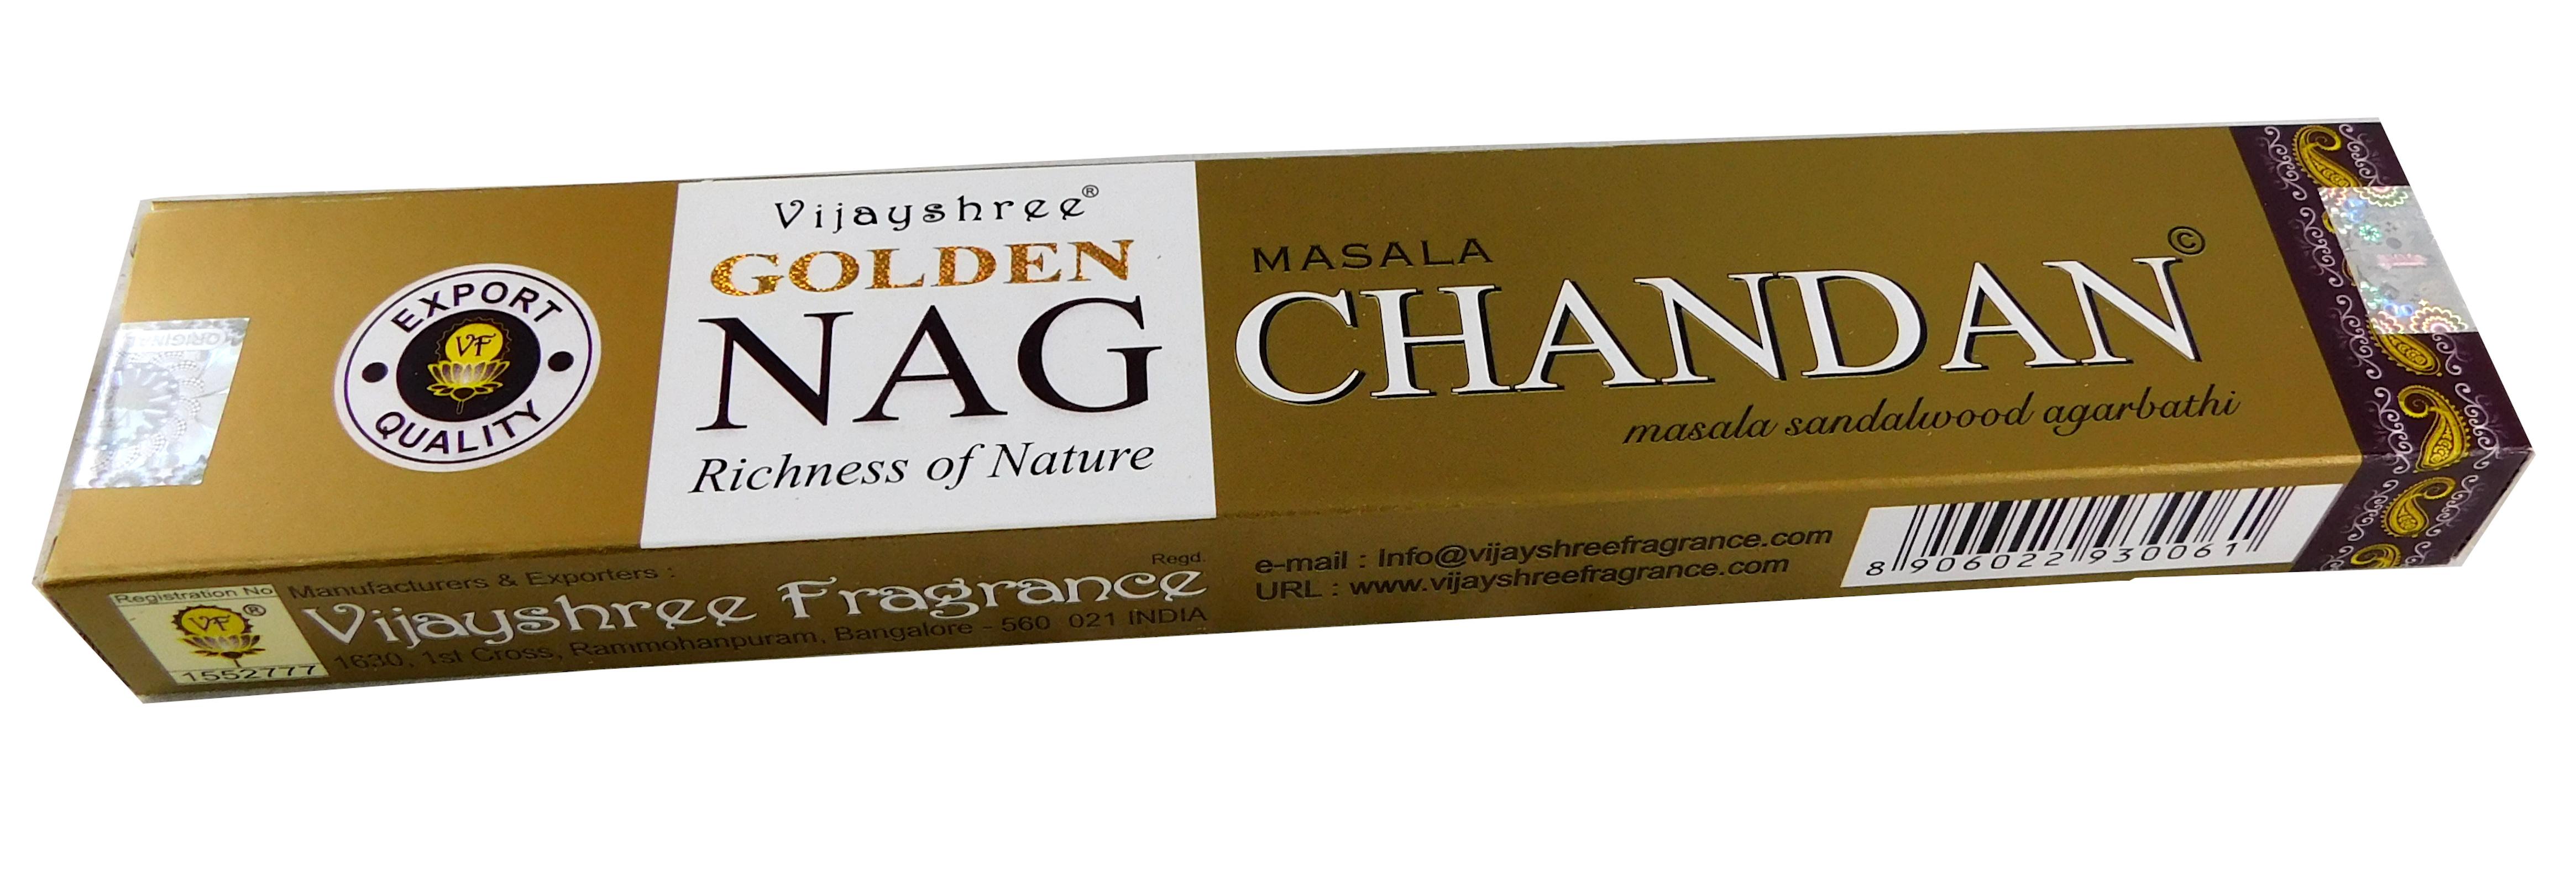 Räucherstäbchen Golden Nag Chandan (Sandelholz) von Vijayshree 15g Packung. Ca. 15 Incence Sticks